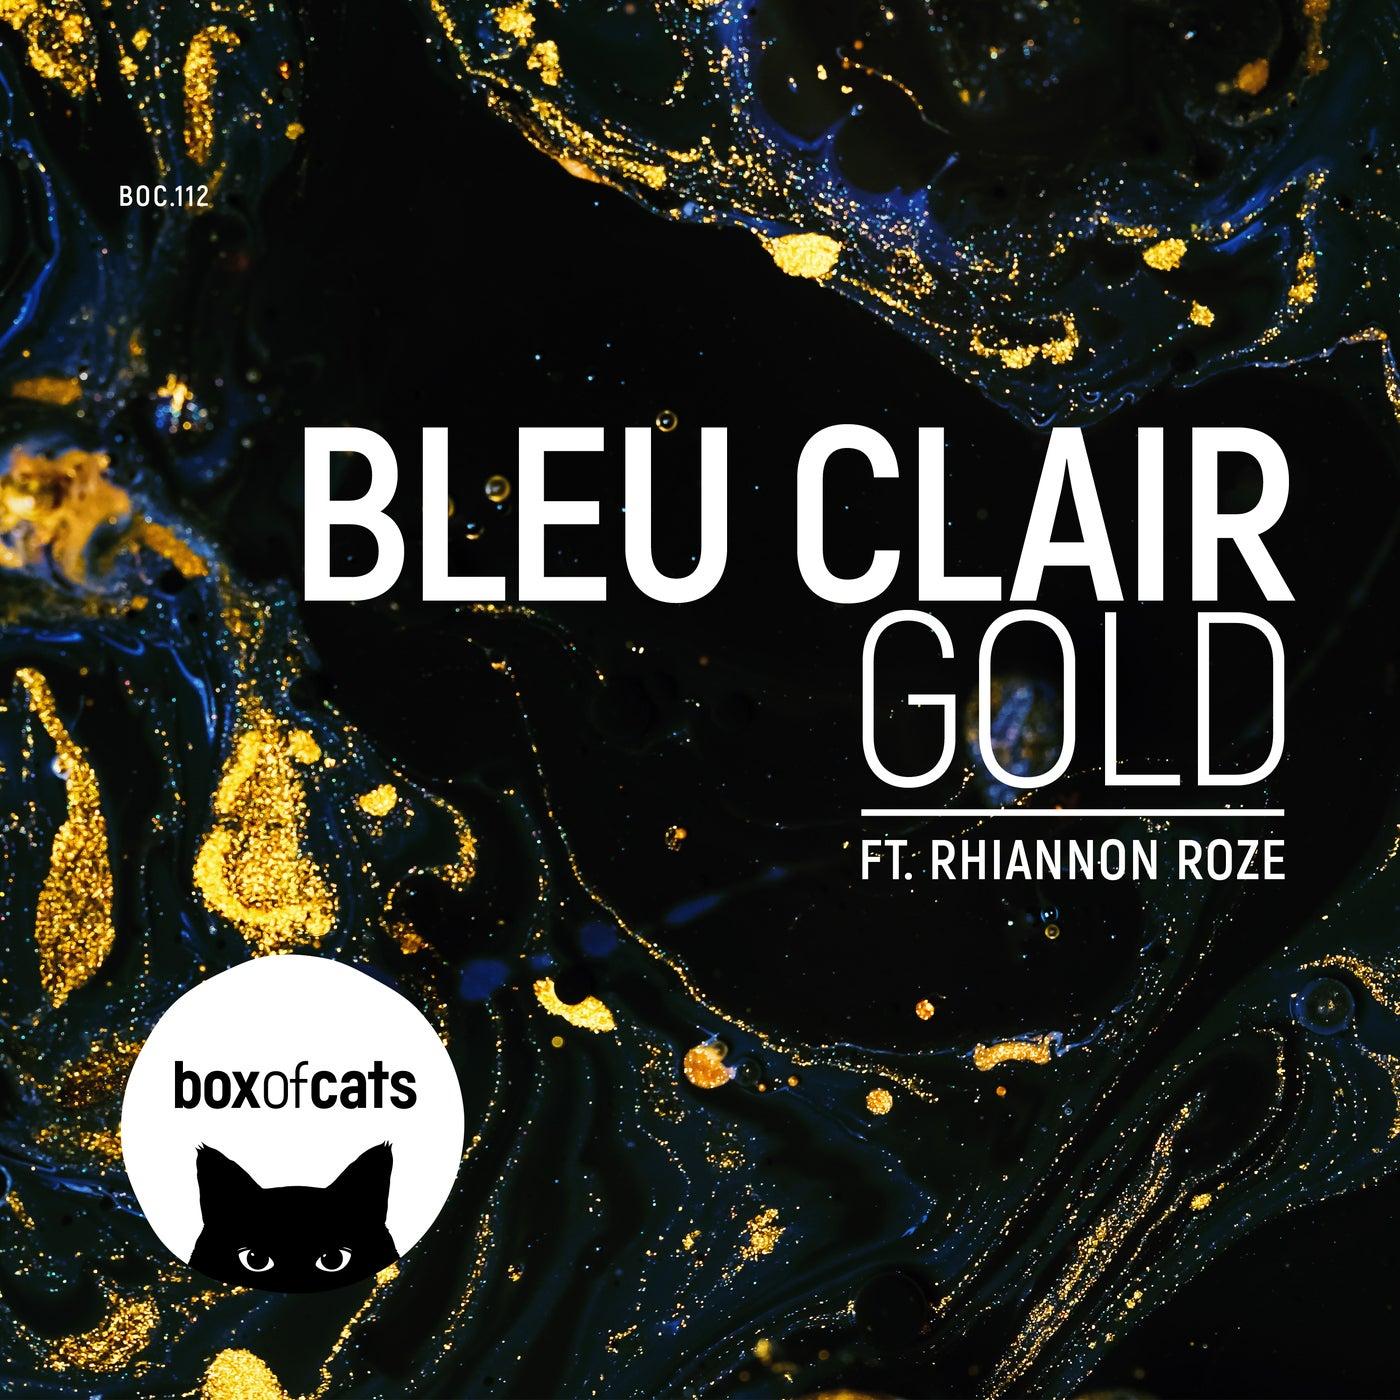 Gold Feat. Rhiannon Roze (Extended Mix)